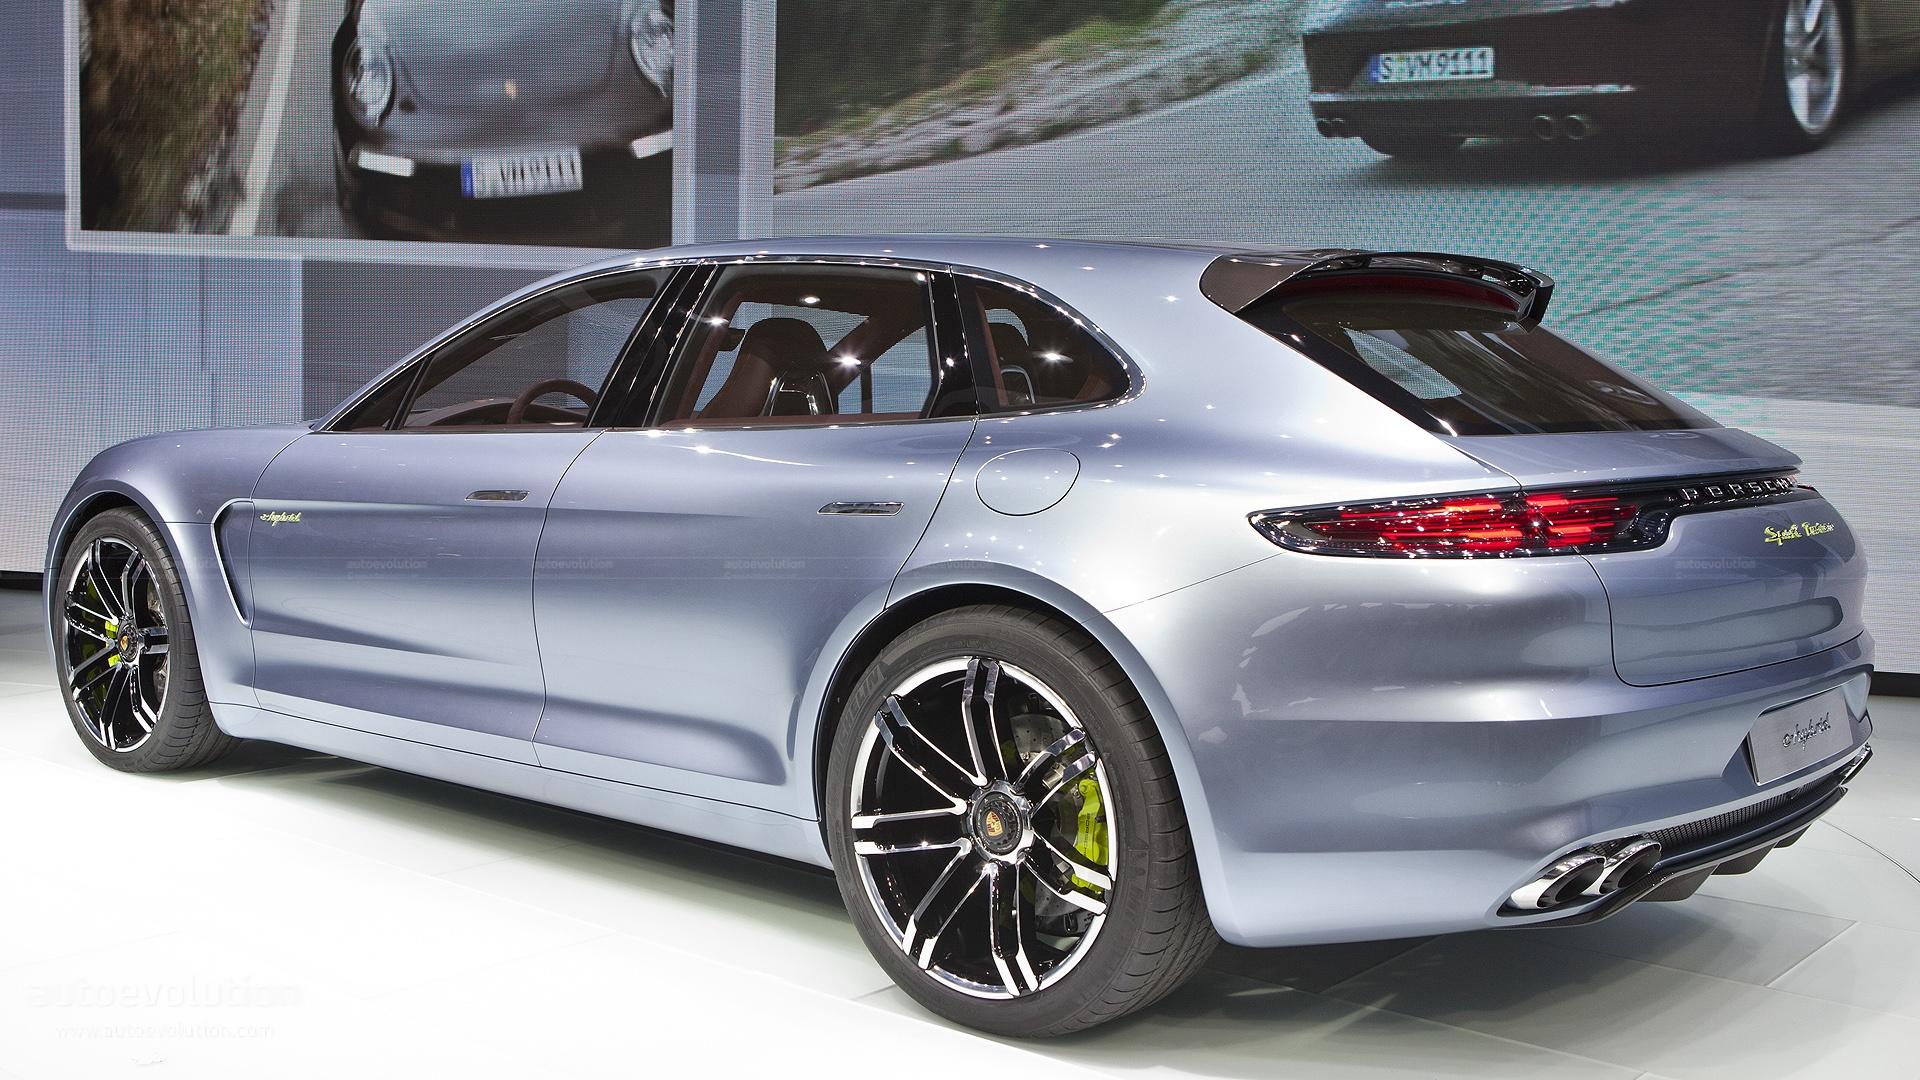 2016 - [Porsche] Panamera II - Page 2 Paris-2012-porsche-panamera-sport-turismo-shooting-brake-live-photos_2